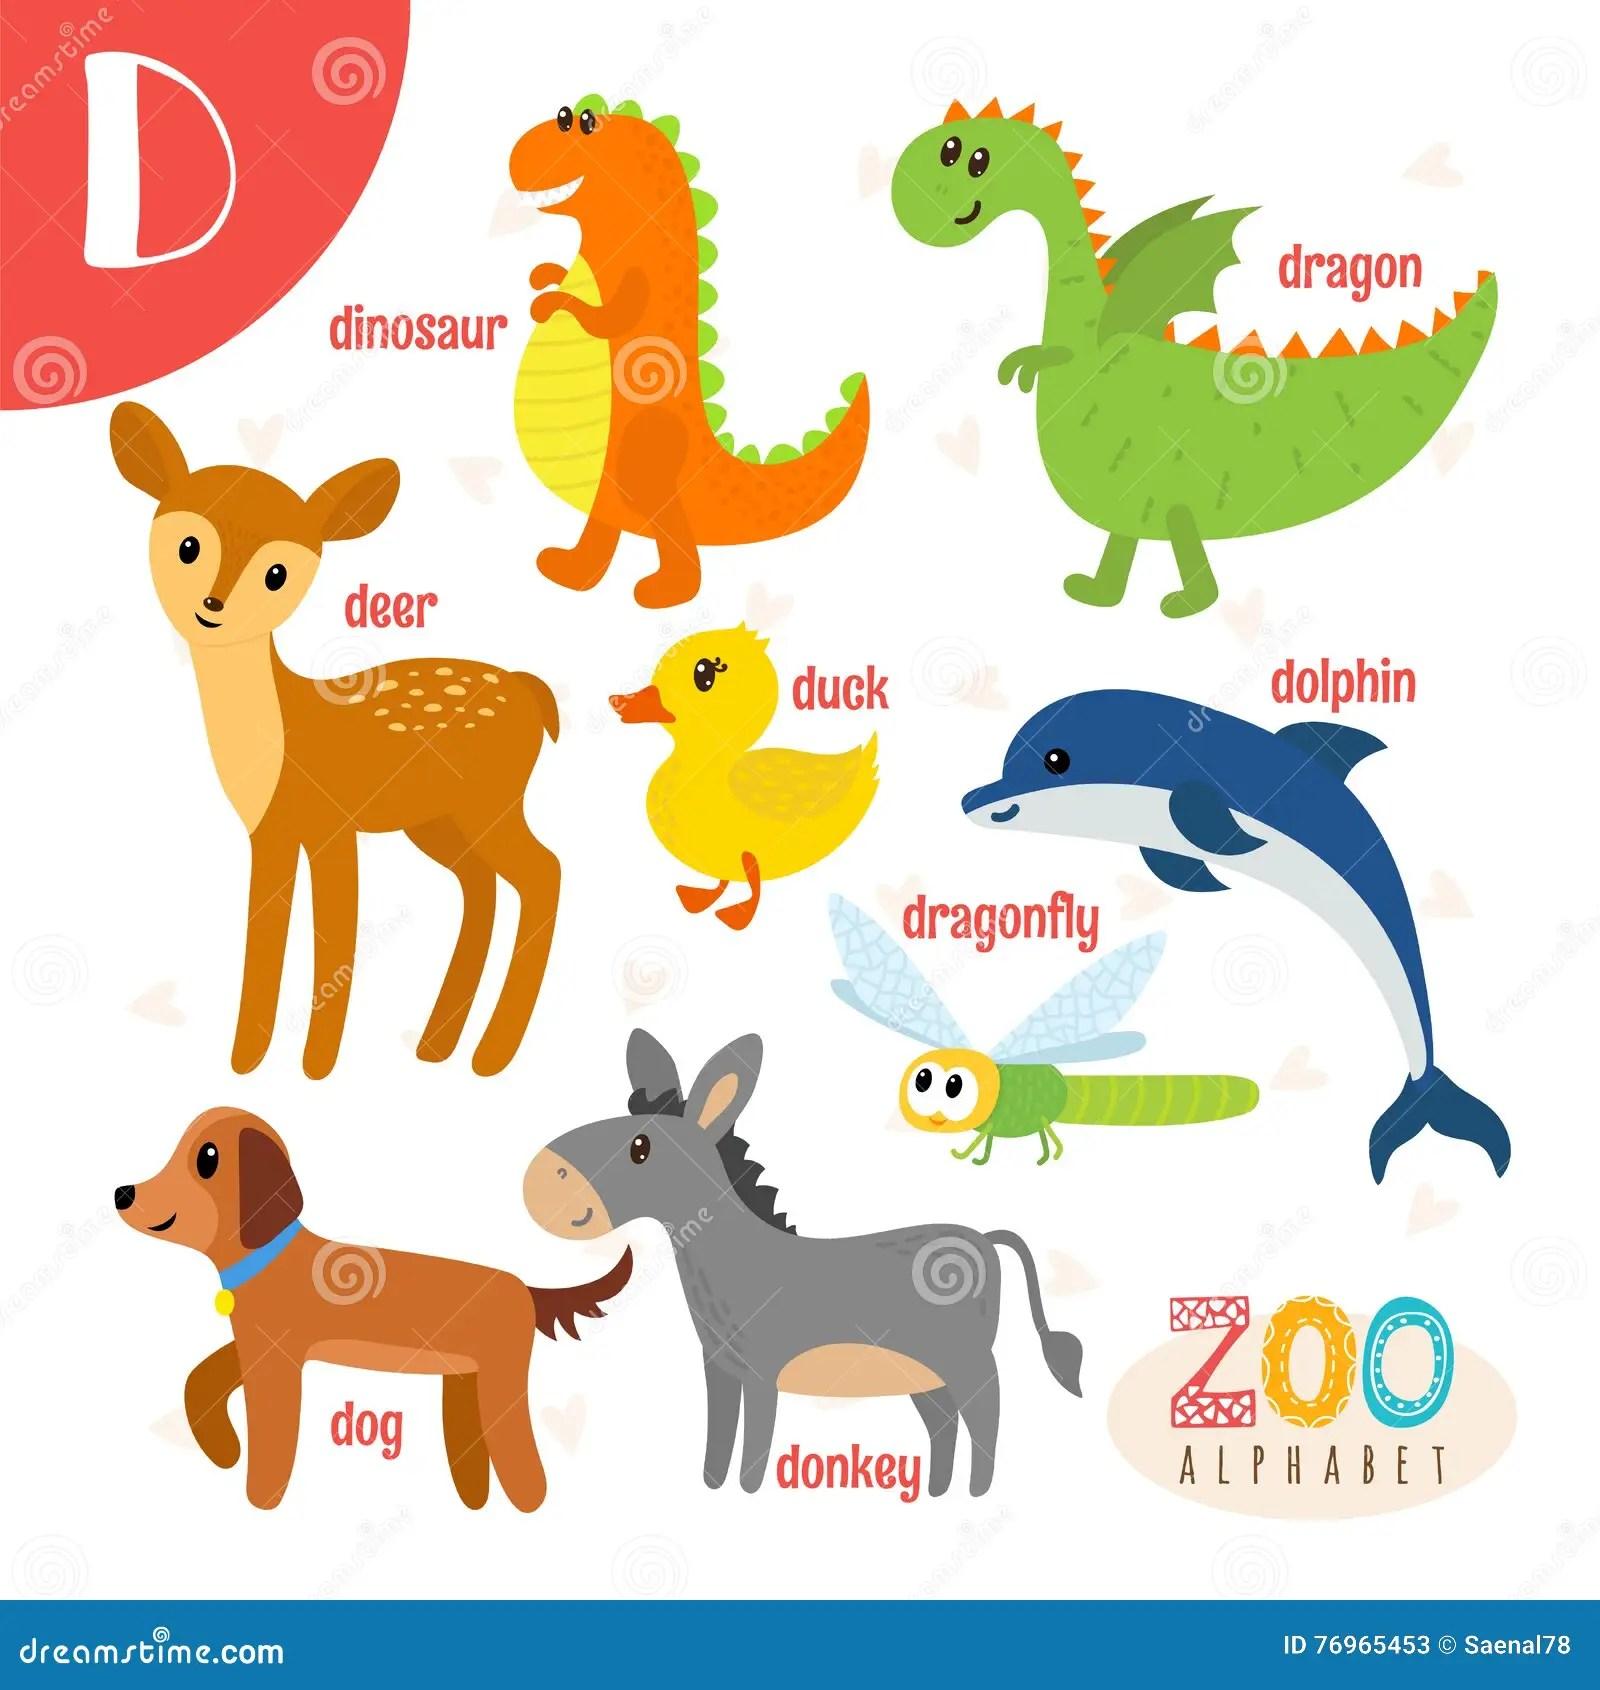 Letter D For Duck Donkey And Dinosaur Vector Illustration